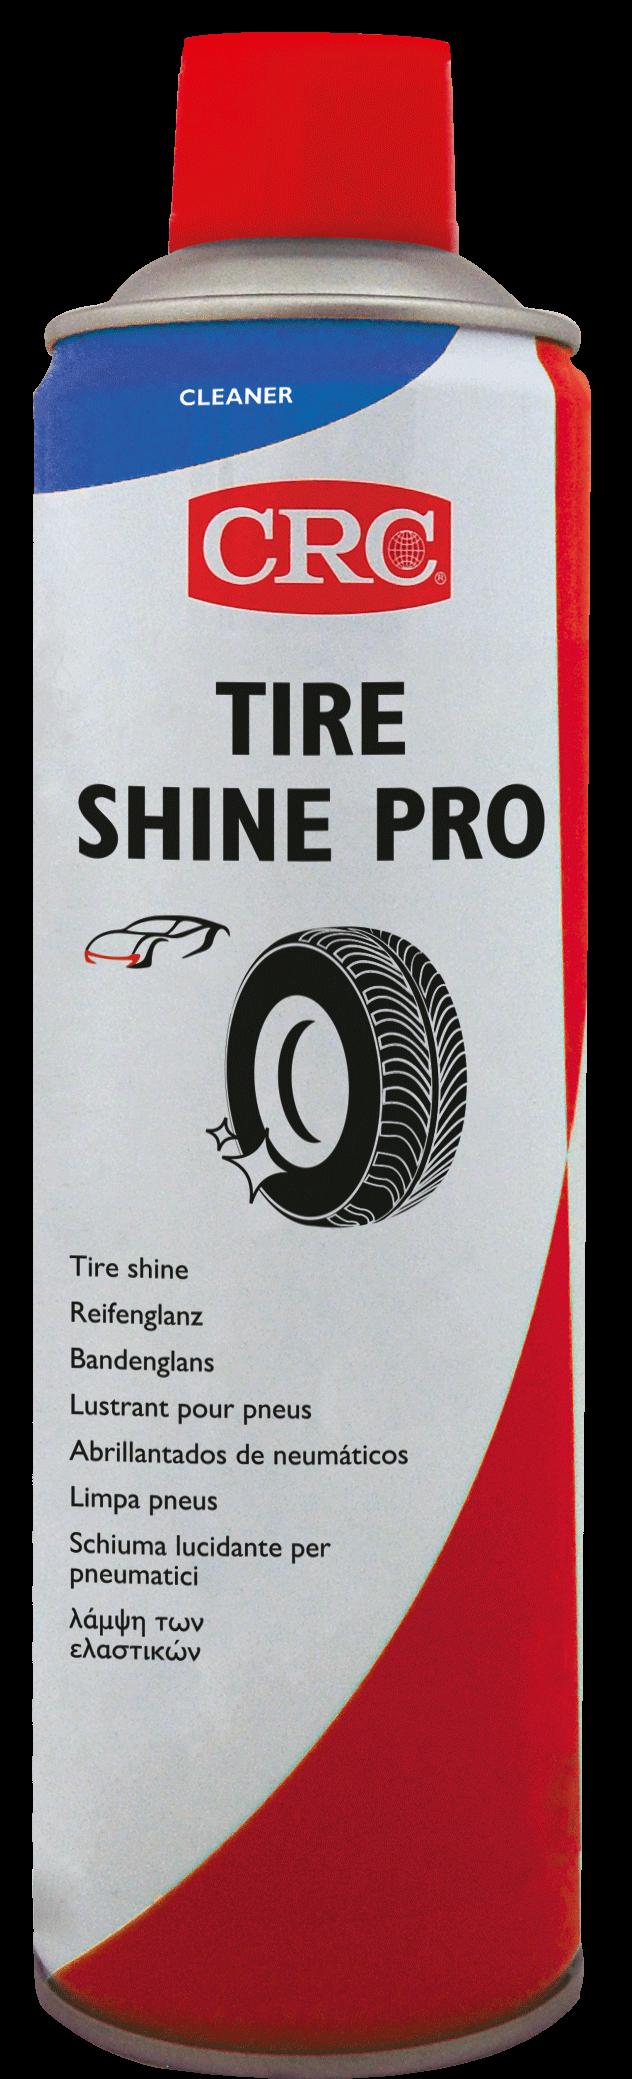 Afbeelding van crc automotive tire shine pro 400 ml, spuitbus